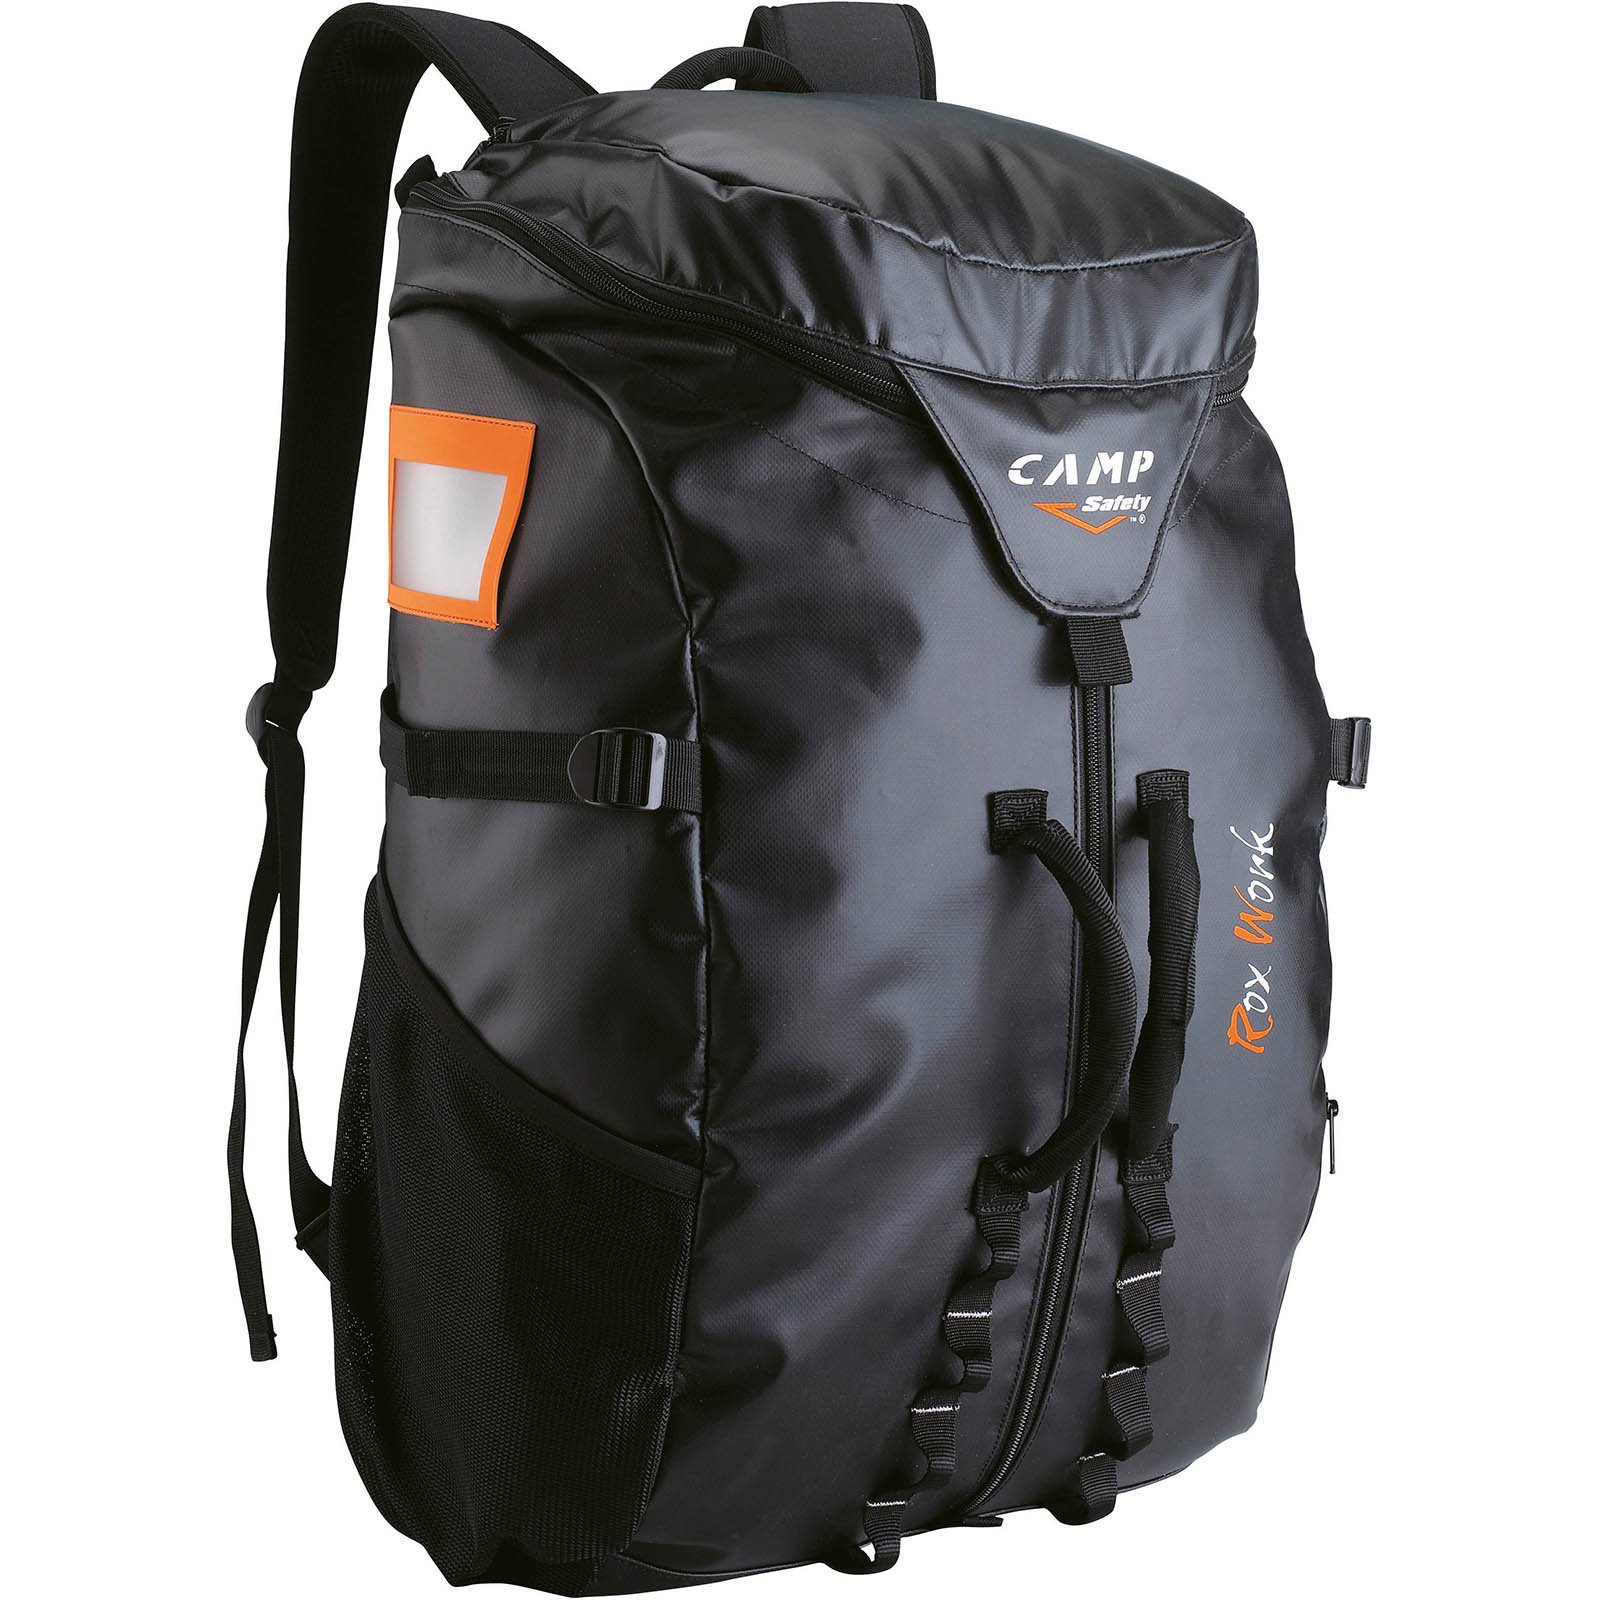 CAMP Rox Work Backpack Gear Bag 40 liter